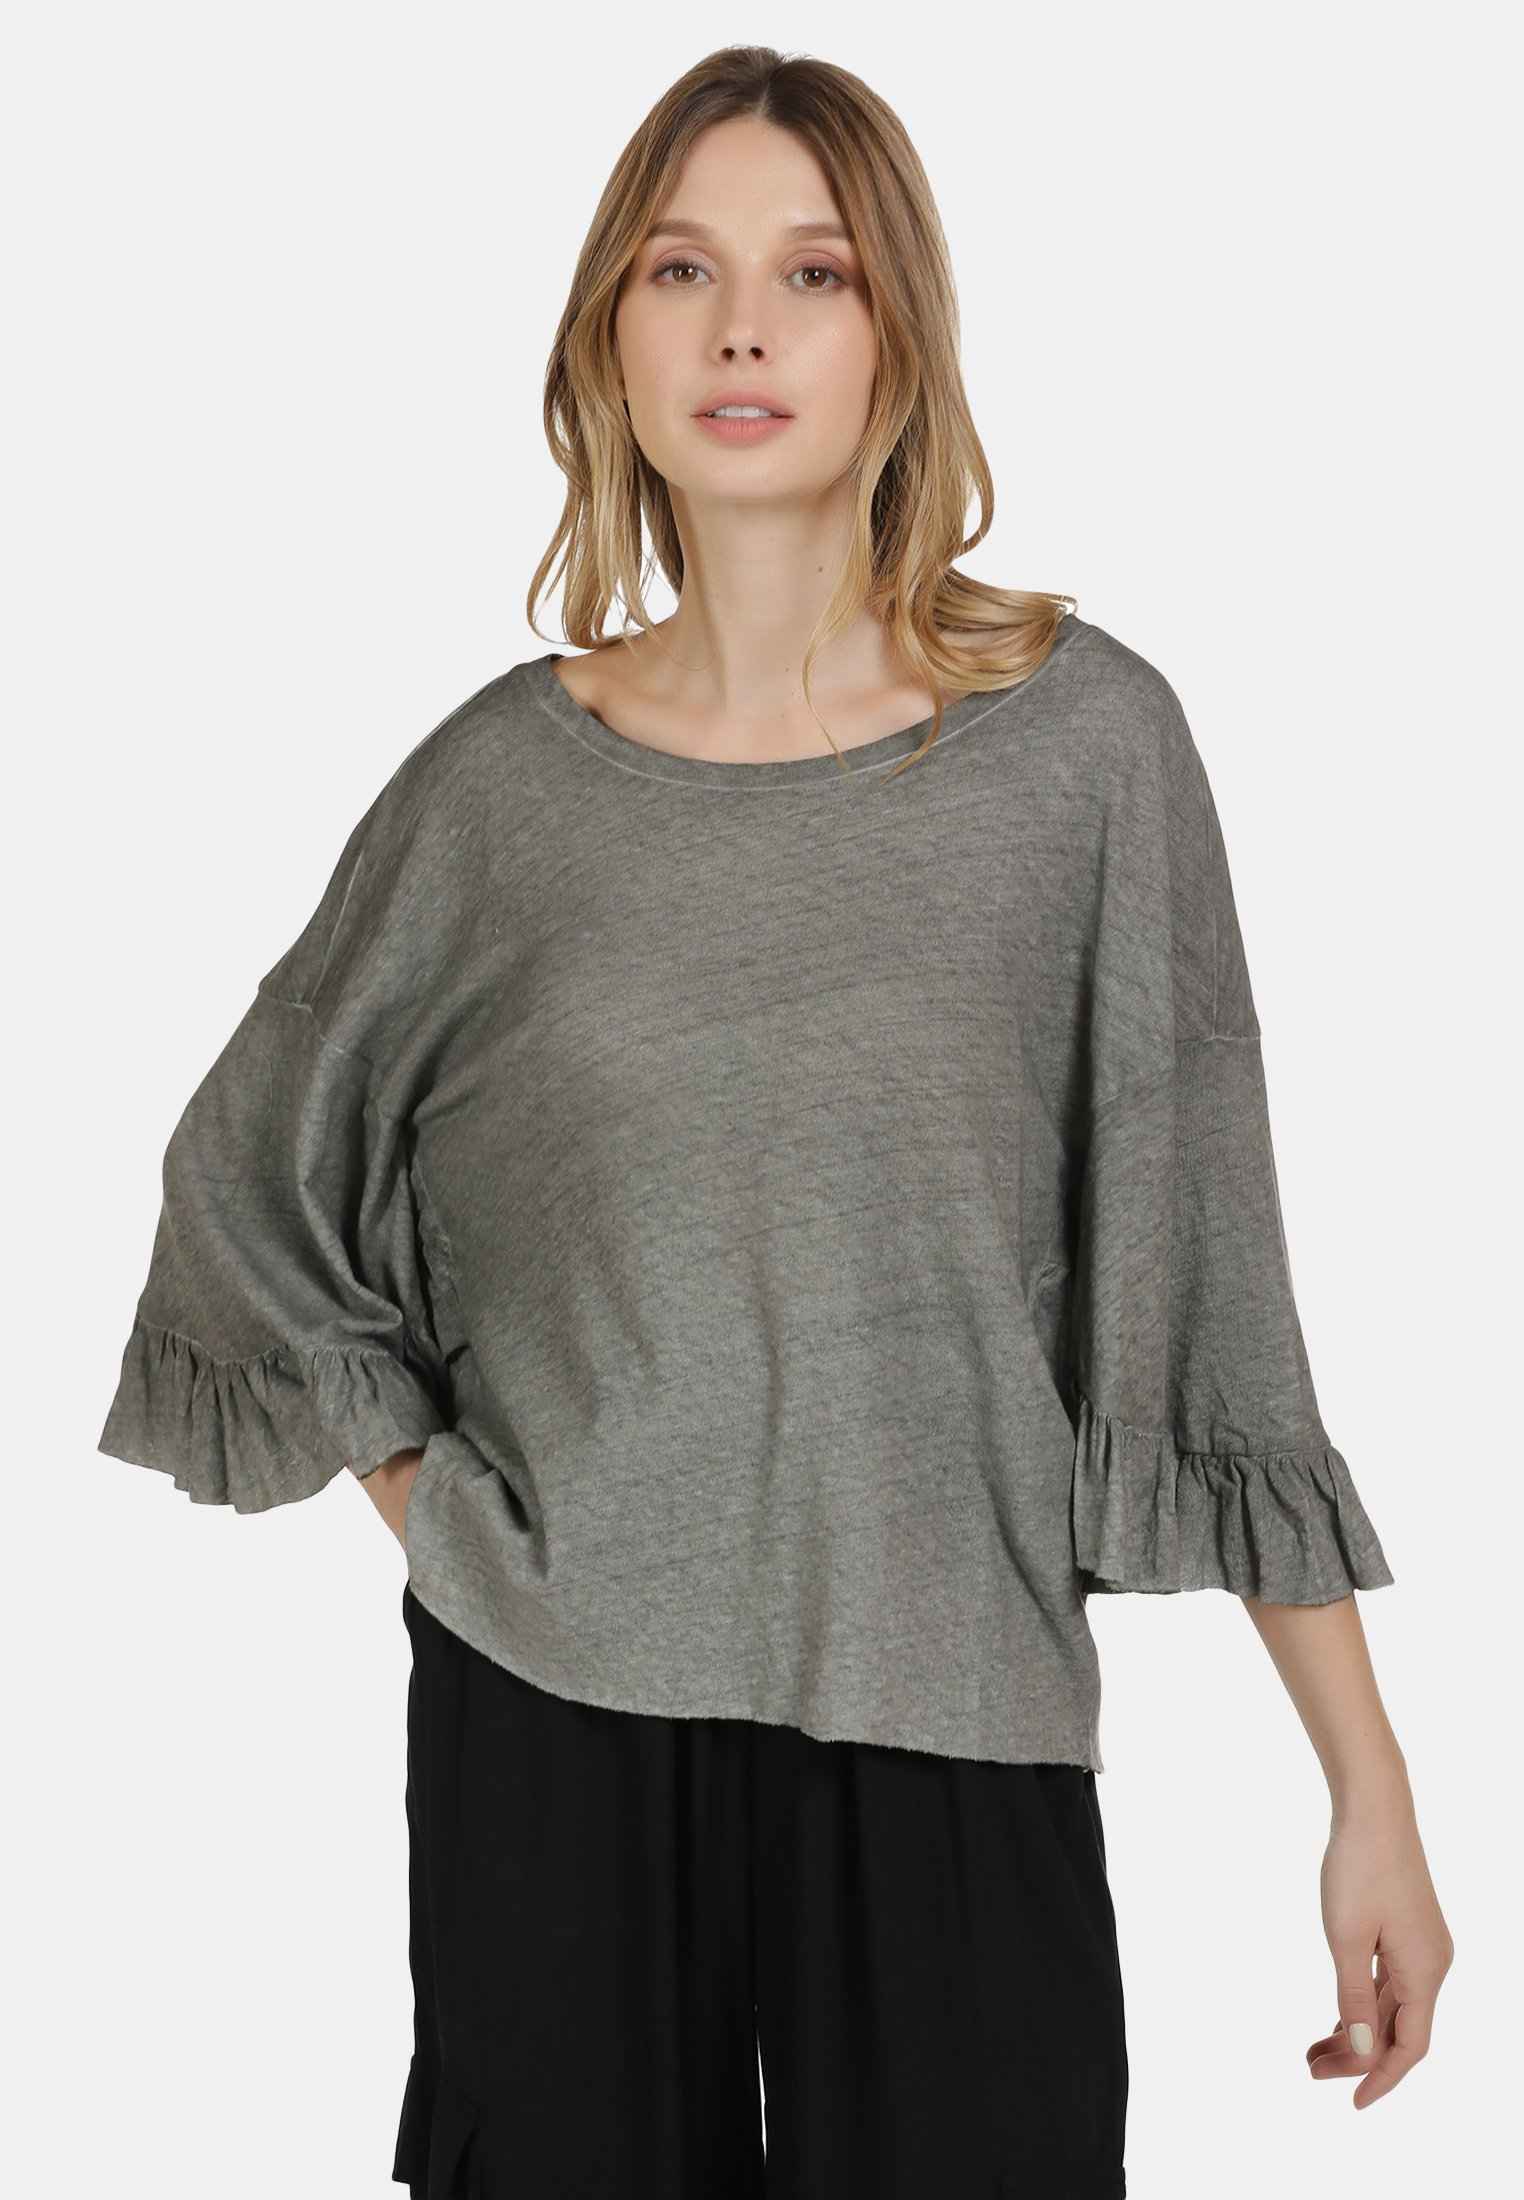 2020 New Women's Clothing DreiMaster BLUSE Blouse dunkelgrau QoBXy9c9P